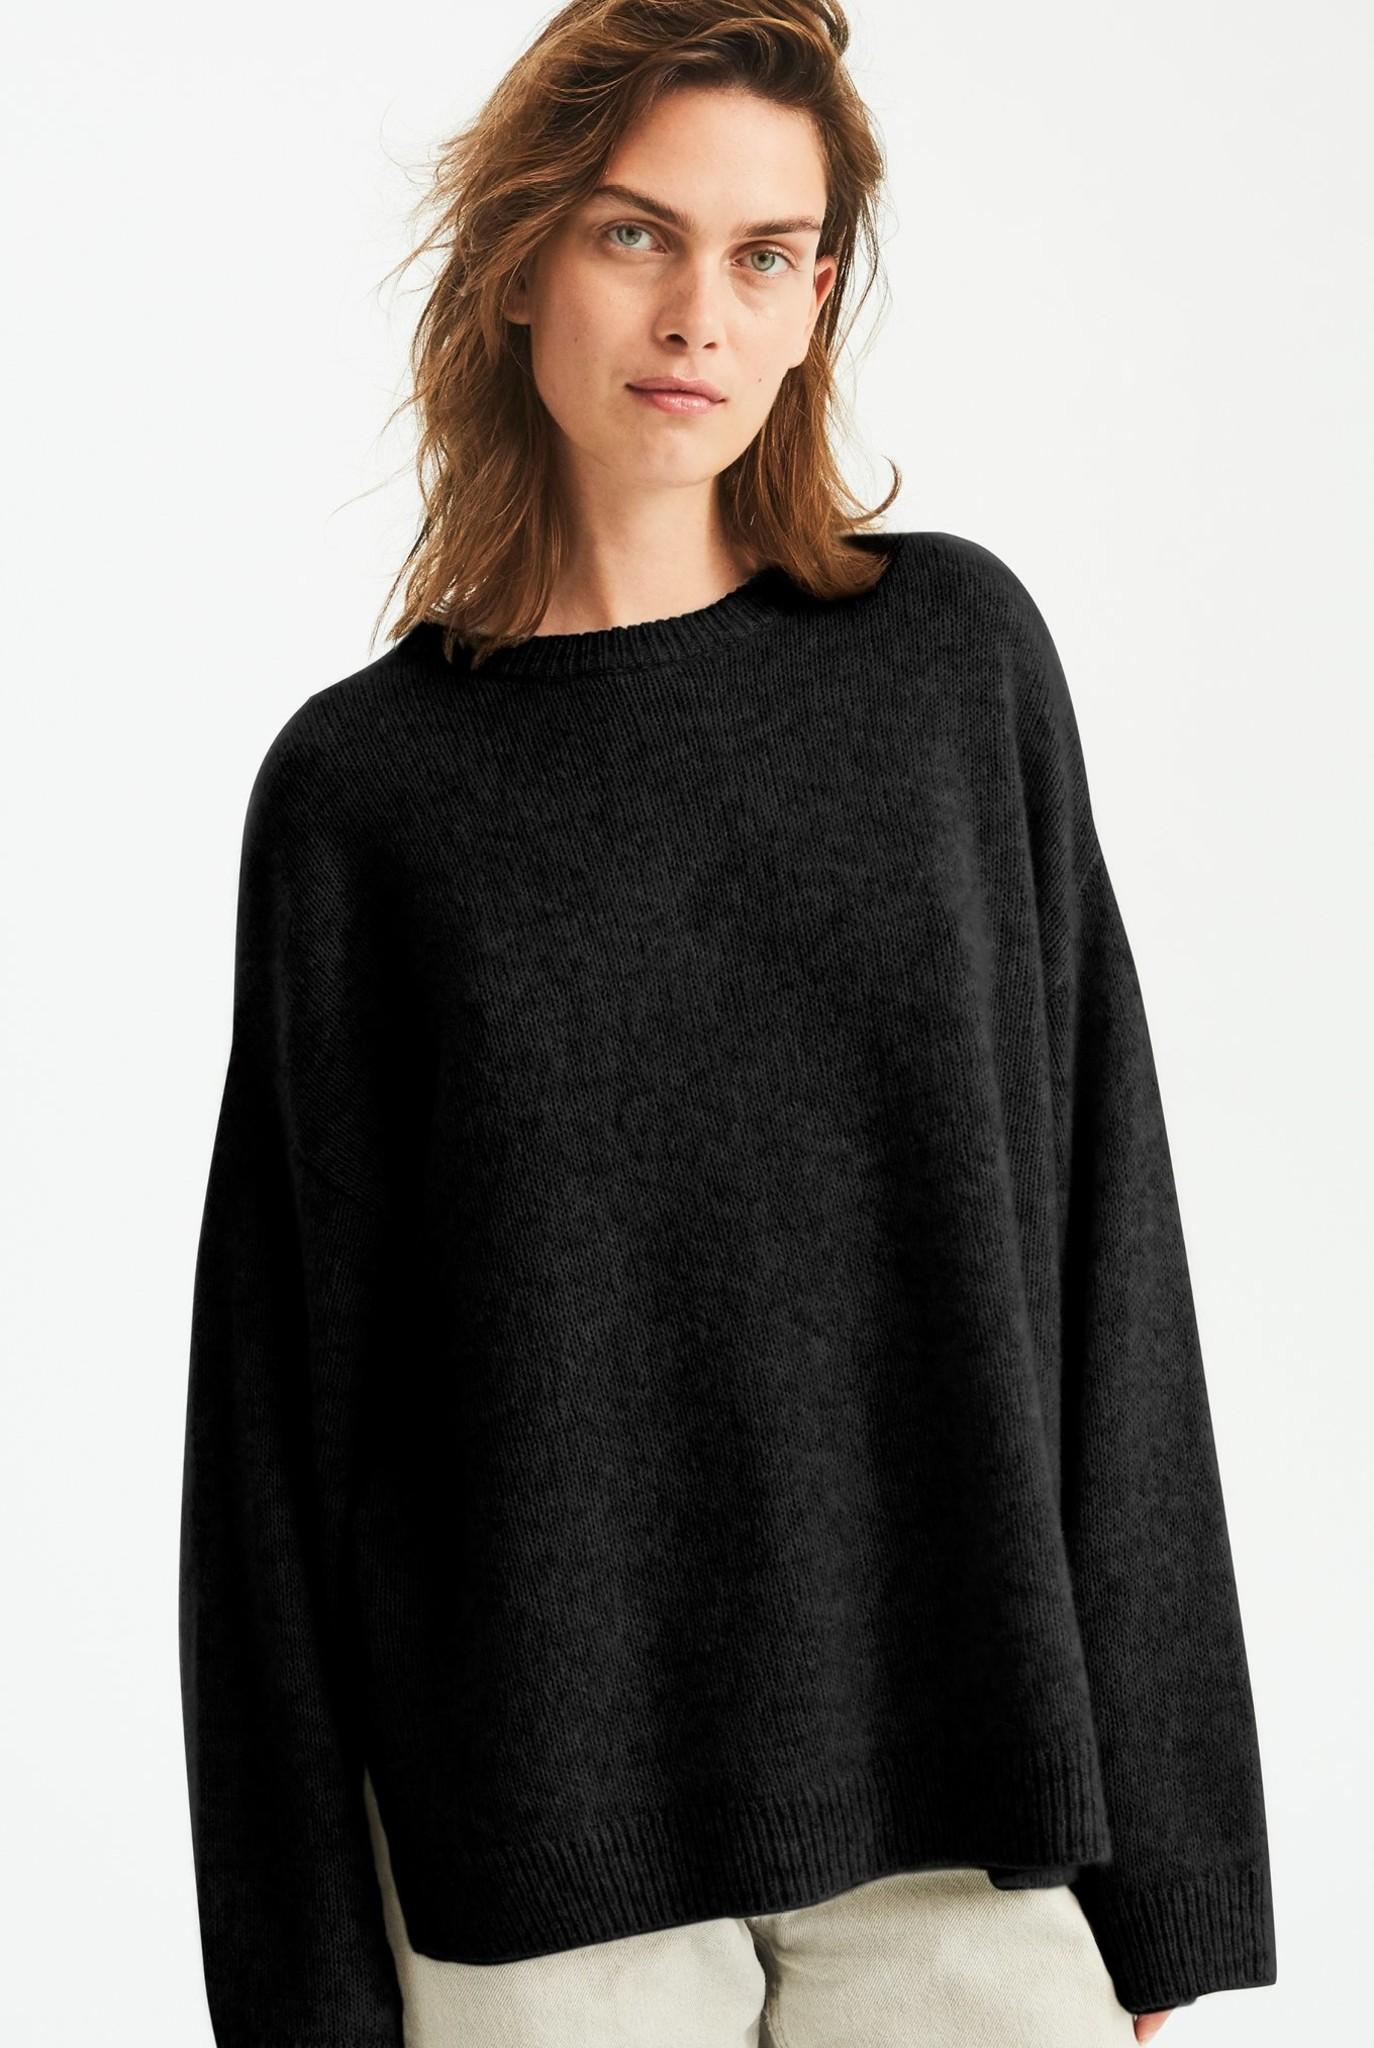 Bez Crew knit black